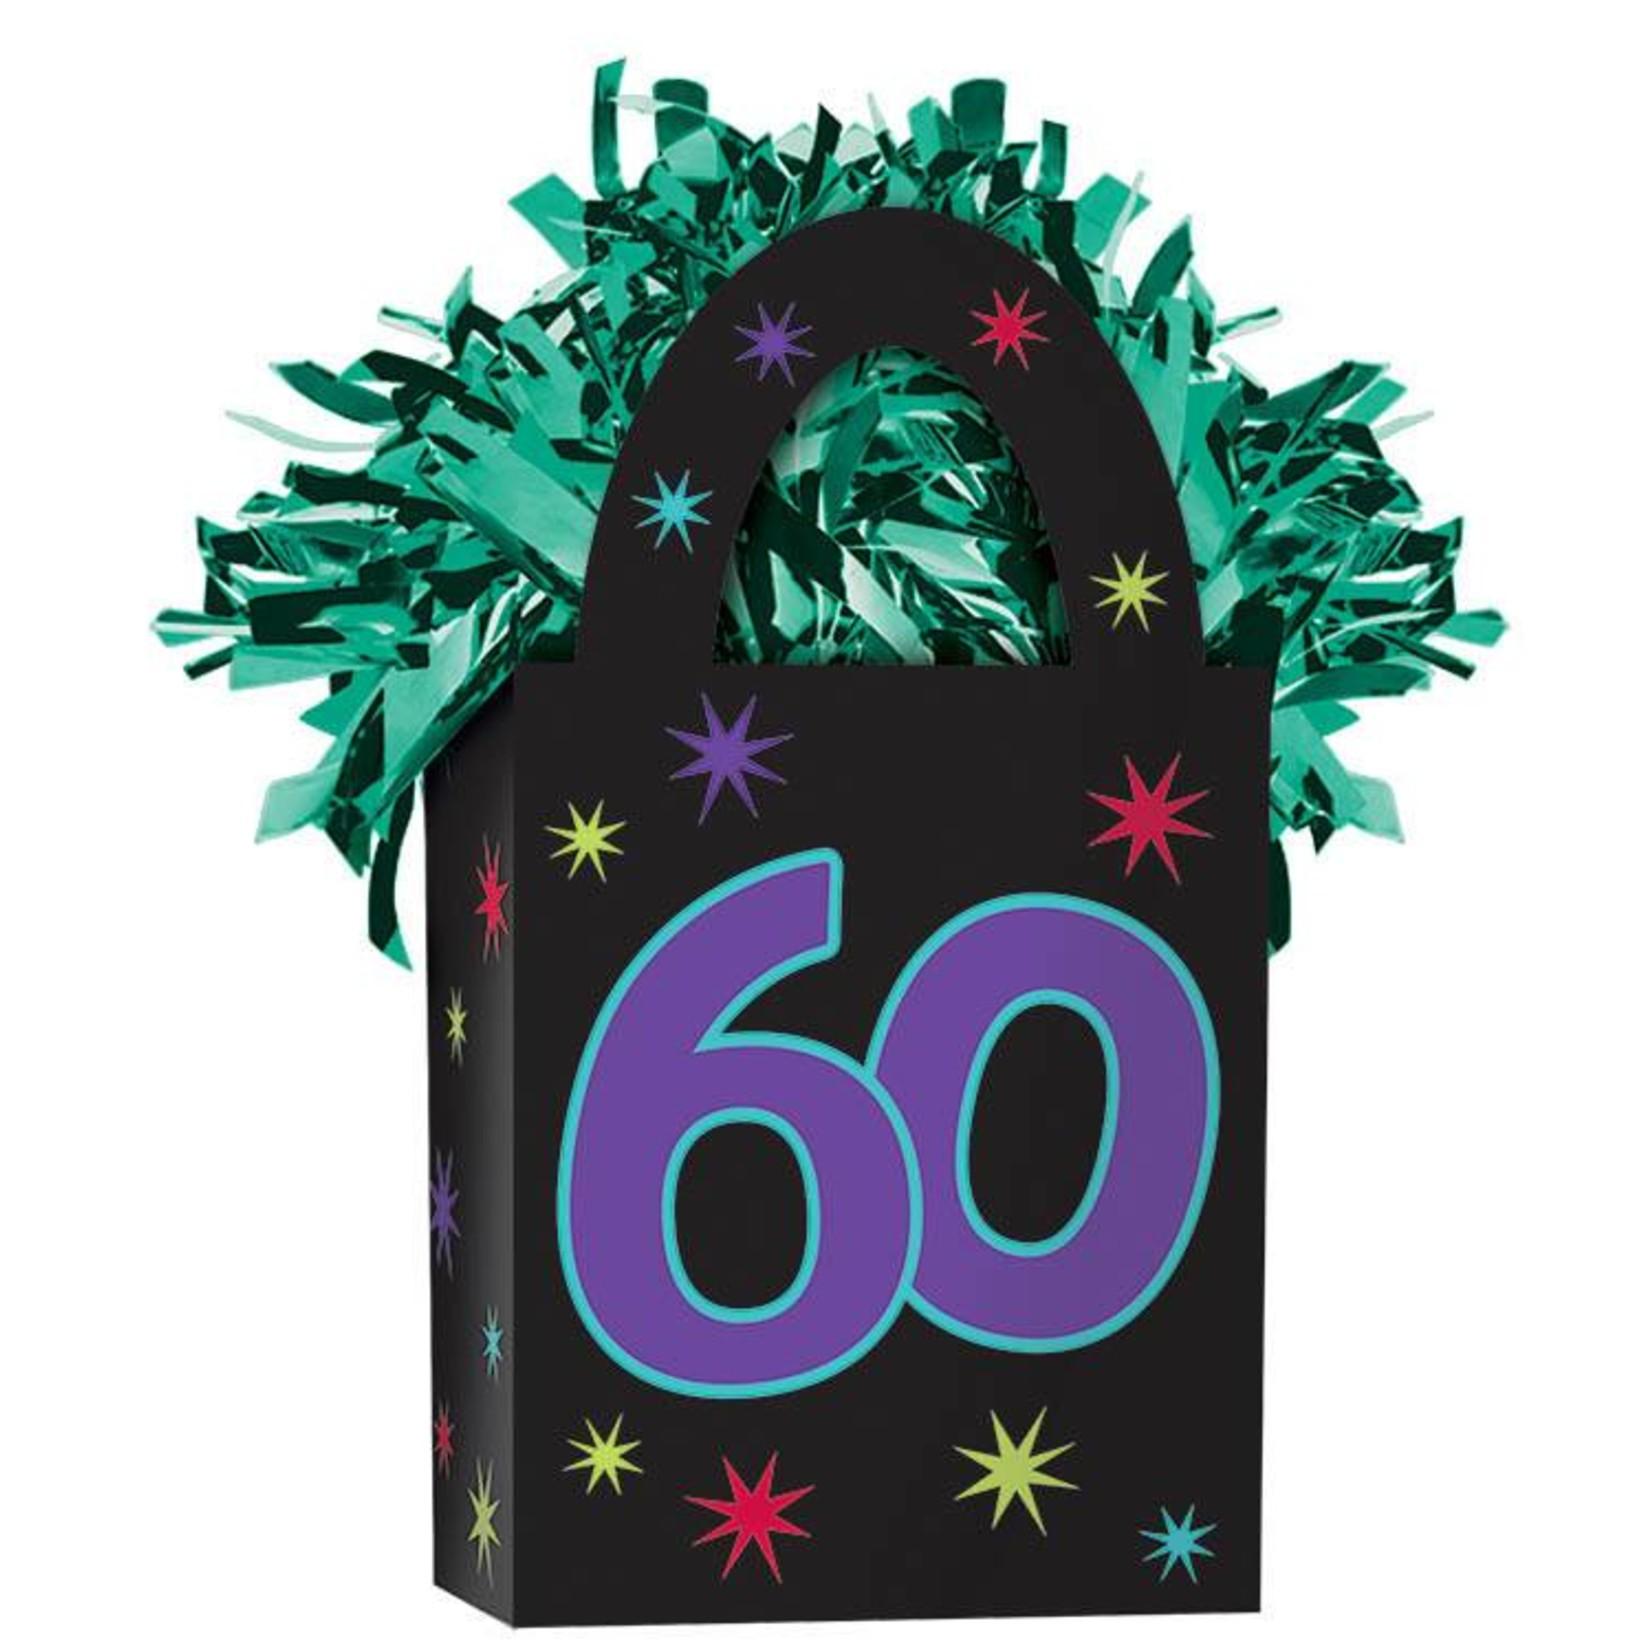 Balloon Weight-60th Birthday-5.7oz